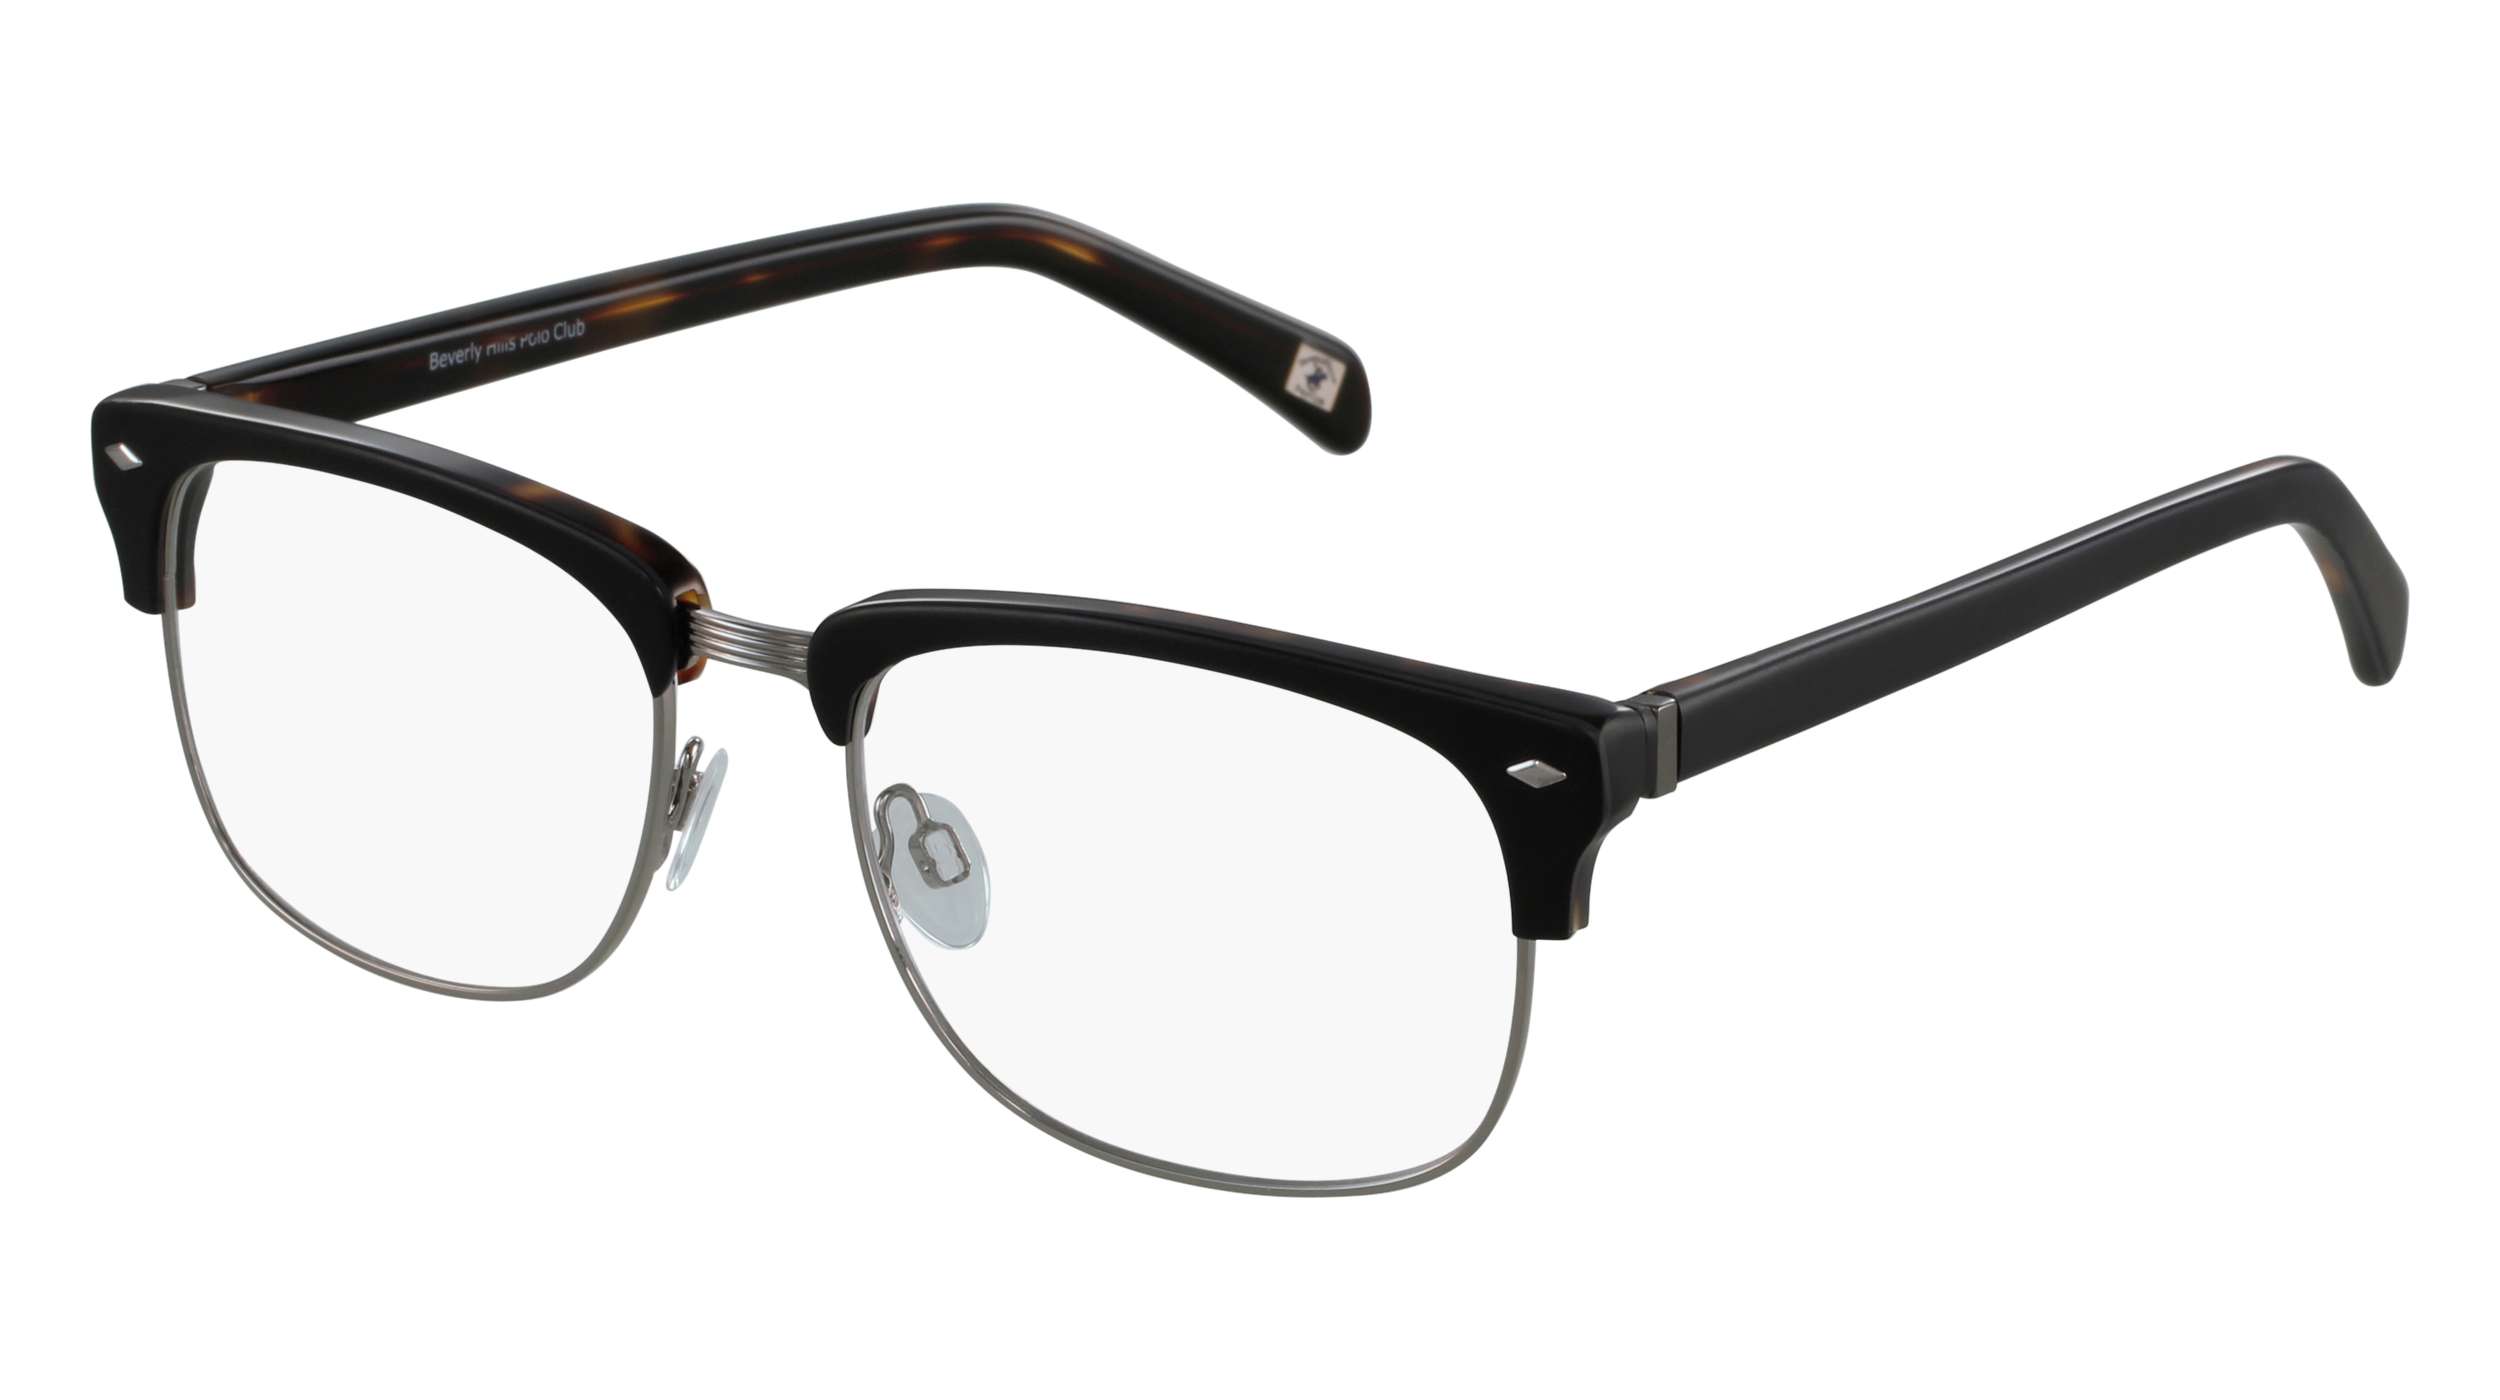 Eyeglasses clipart close. Download eyeglass sunglasses ray